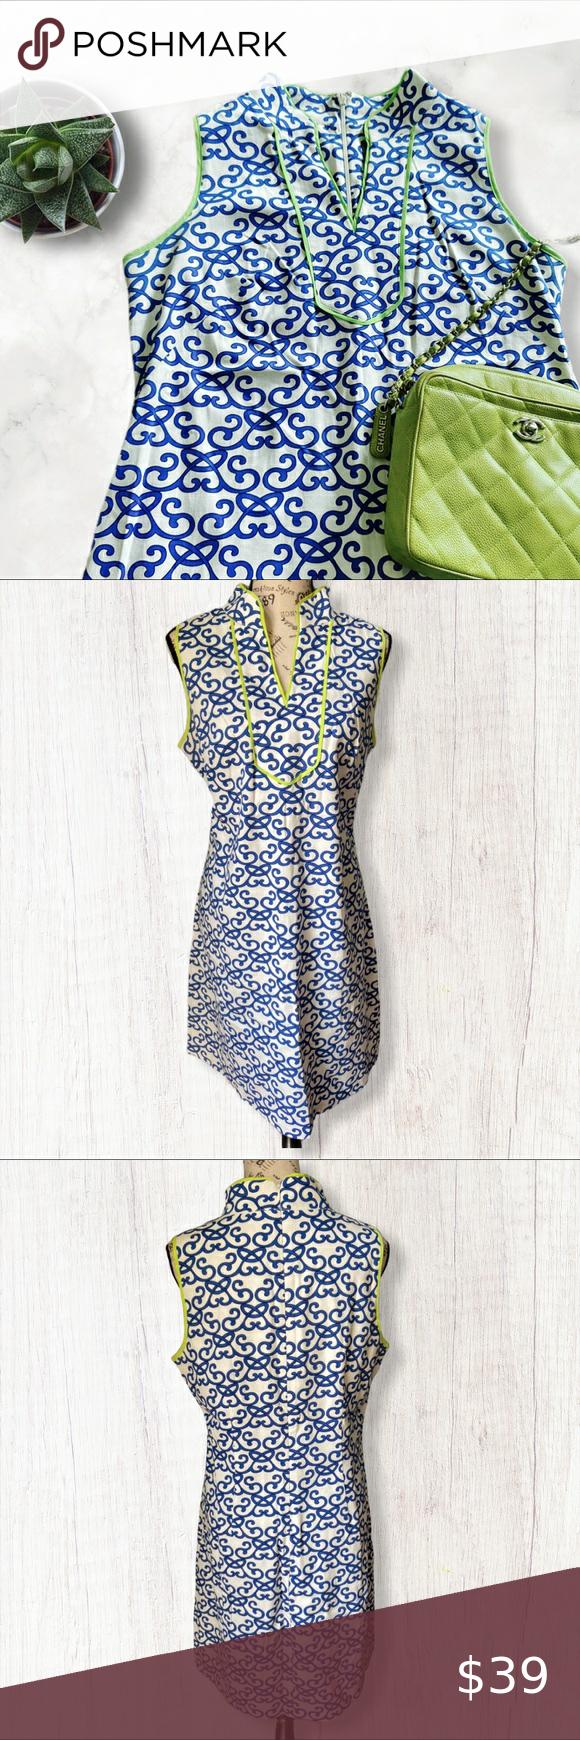 Vince Camuto Mandarin Collar Dress Collar Dress Mandarin Collar Dress Mandarin Collar [ 1740 x 580 Pixel ]